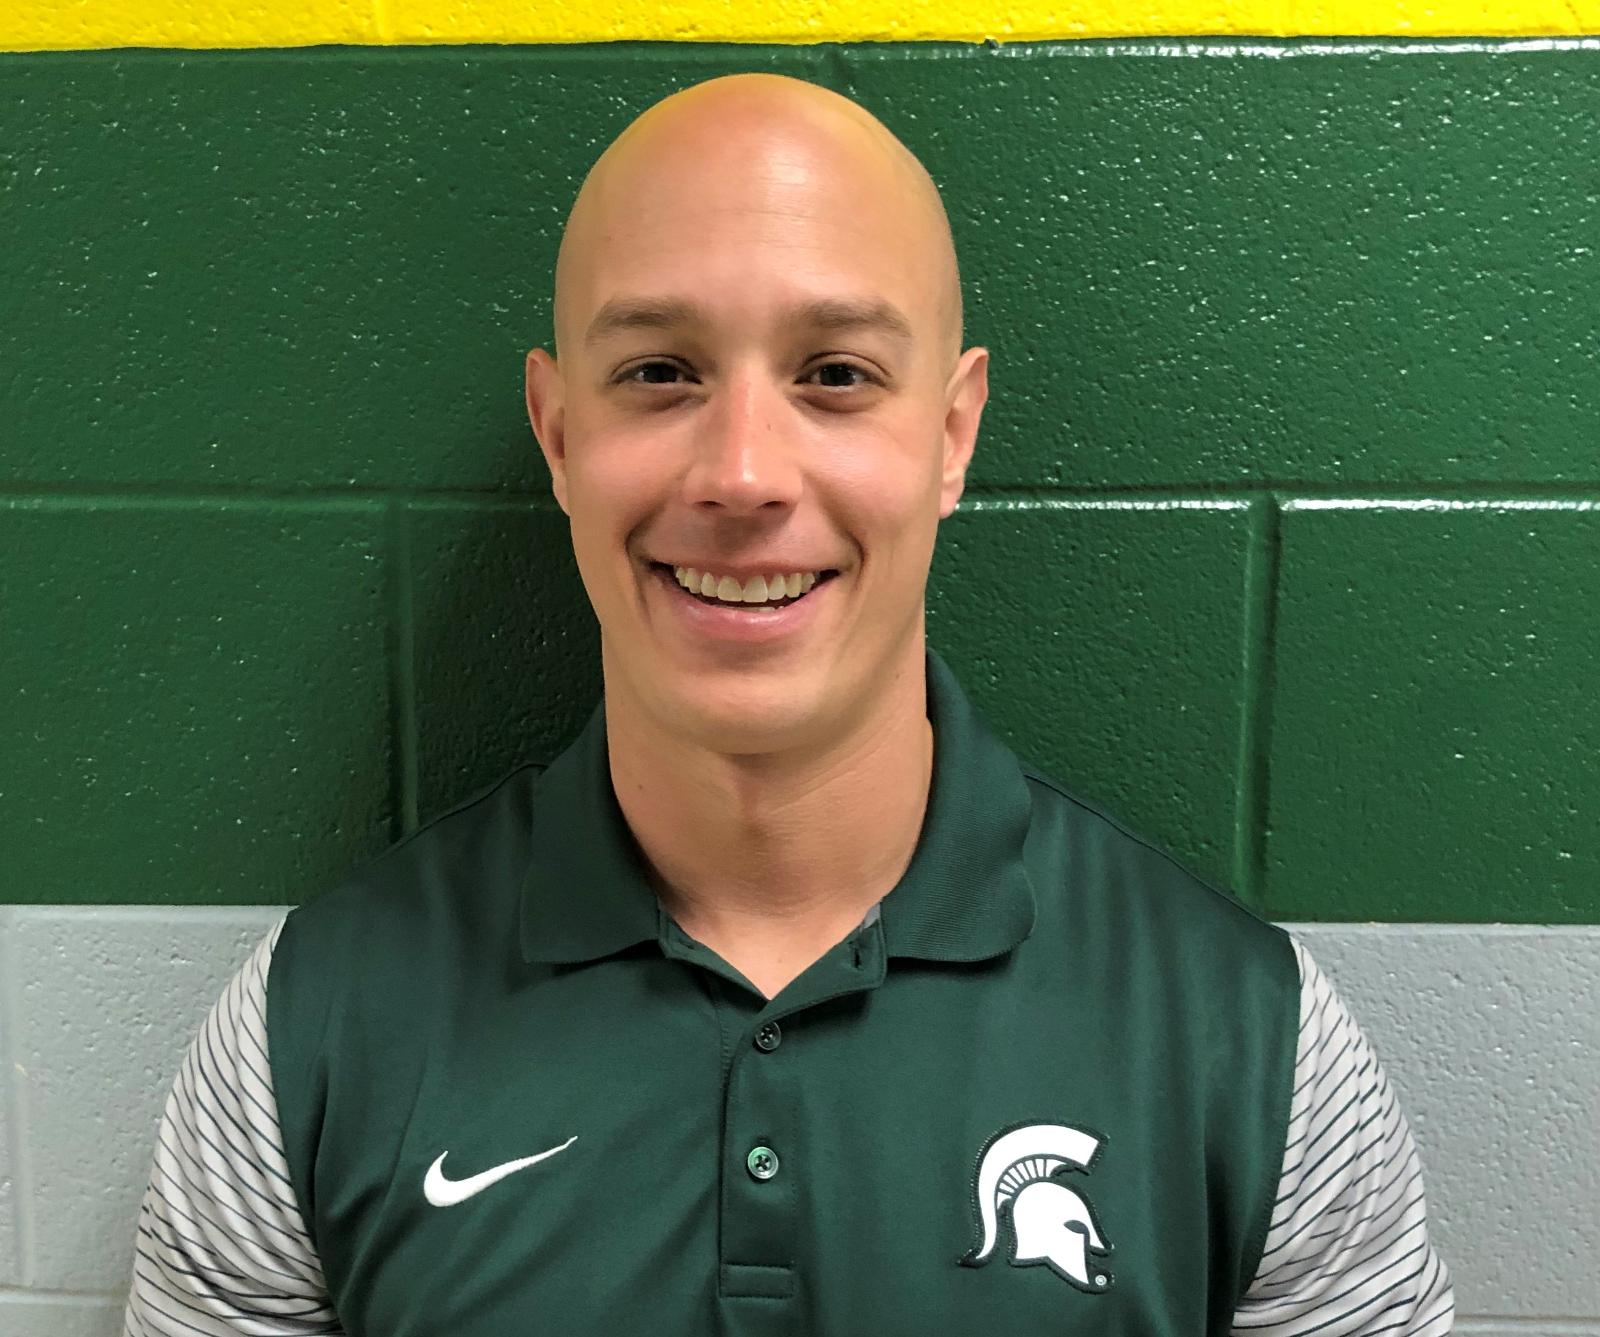 Dane Franklin tabbed as next Women's Basketball Coach